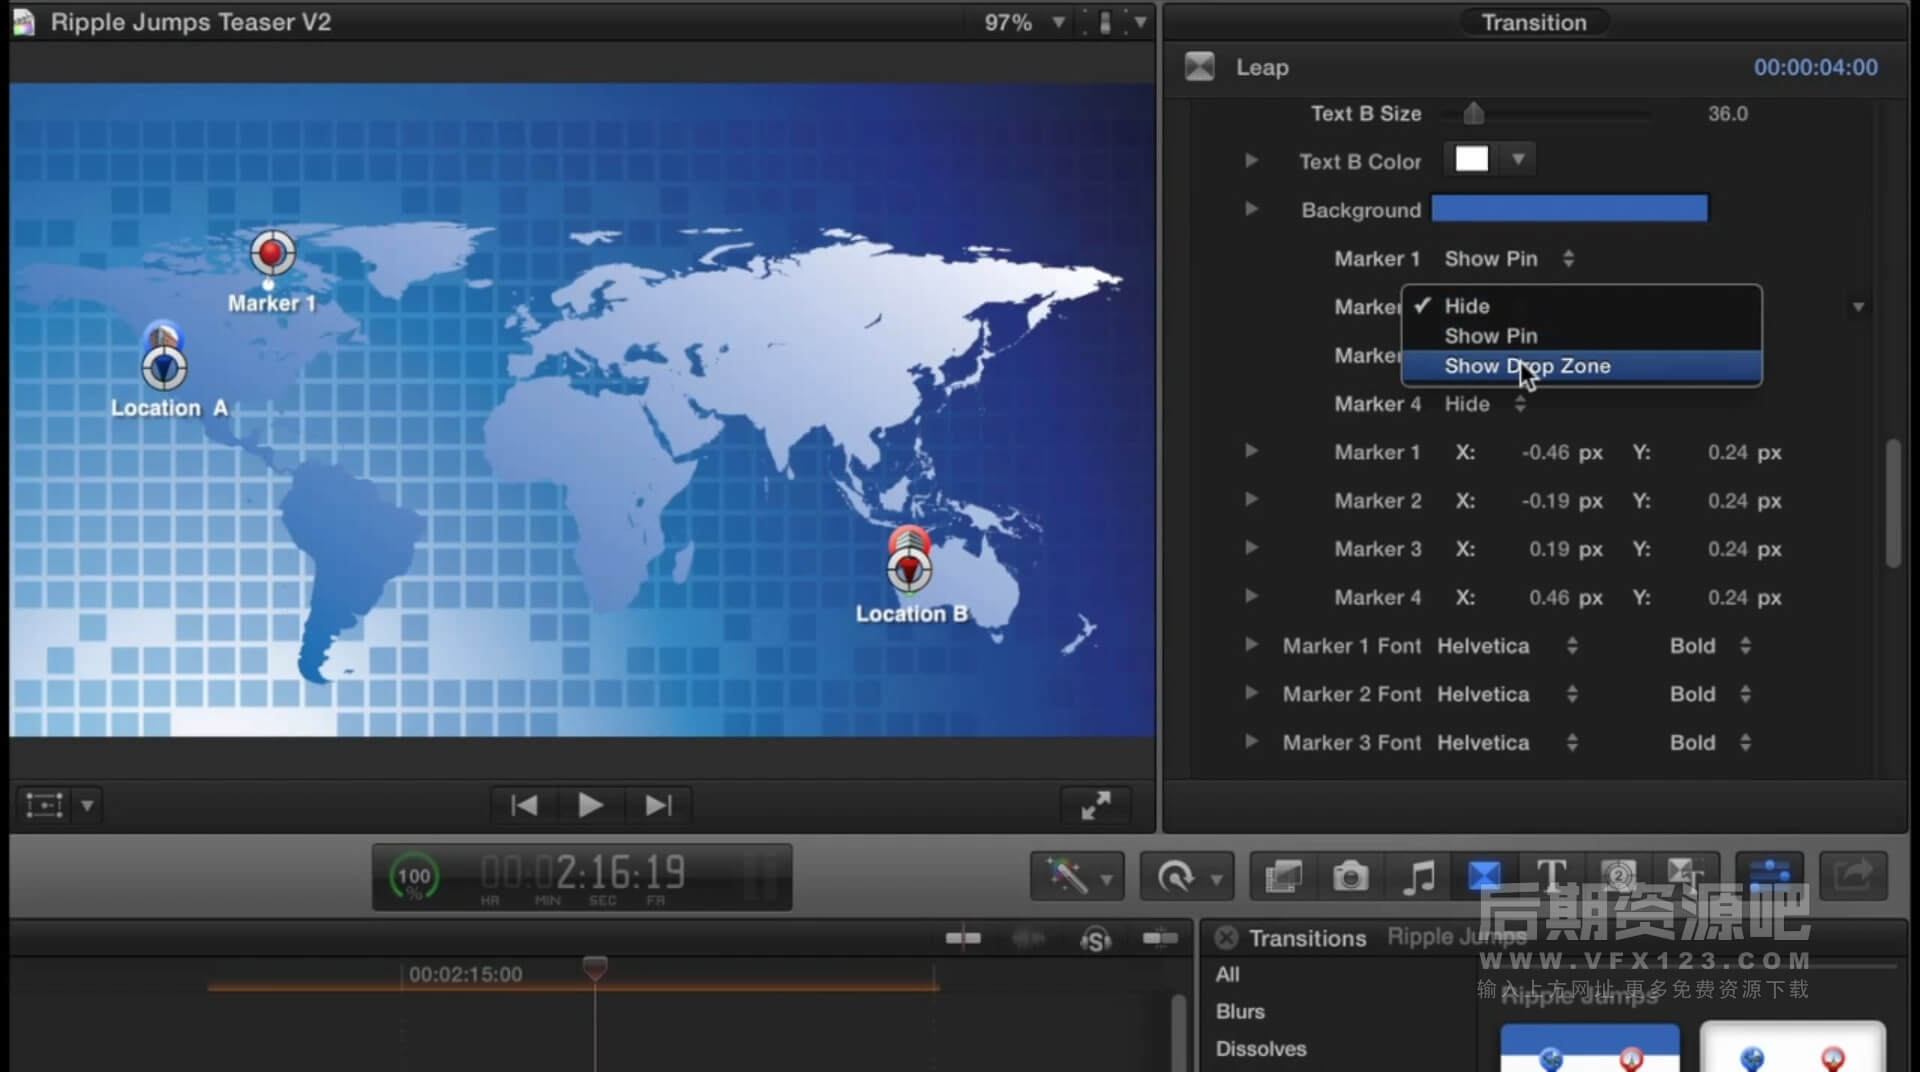 Fcpx转场插件 地图标记位置切换转场 旅拍Vlog常用转场效果 Ripple Jumps